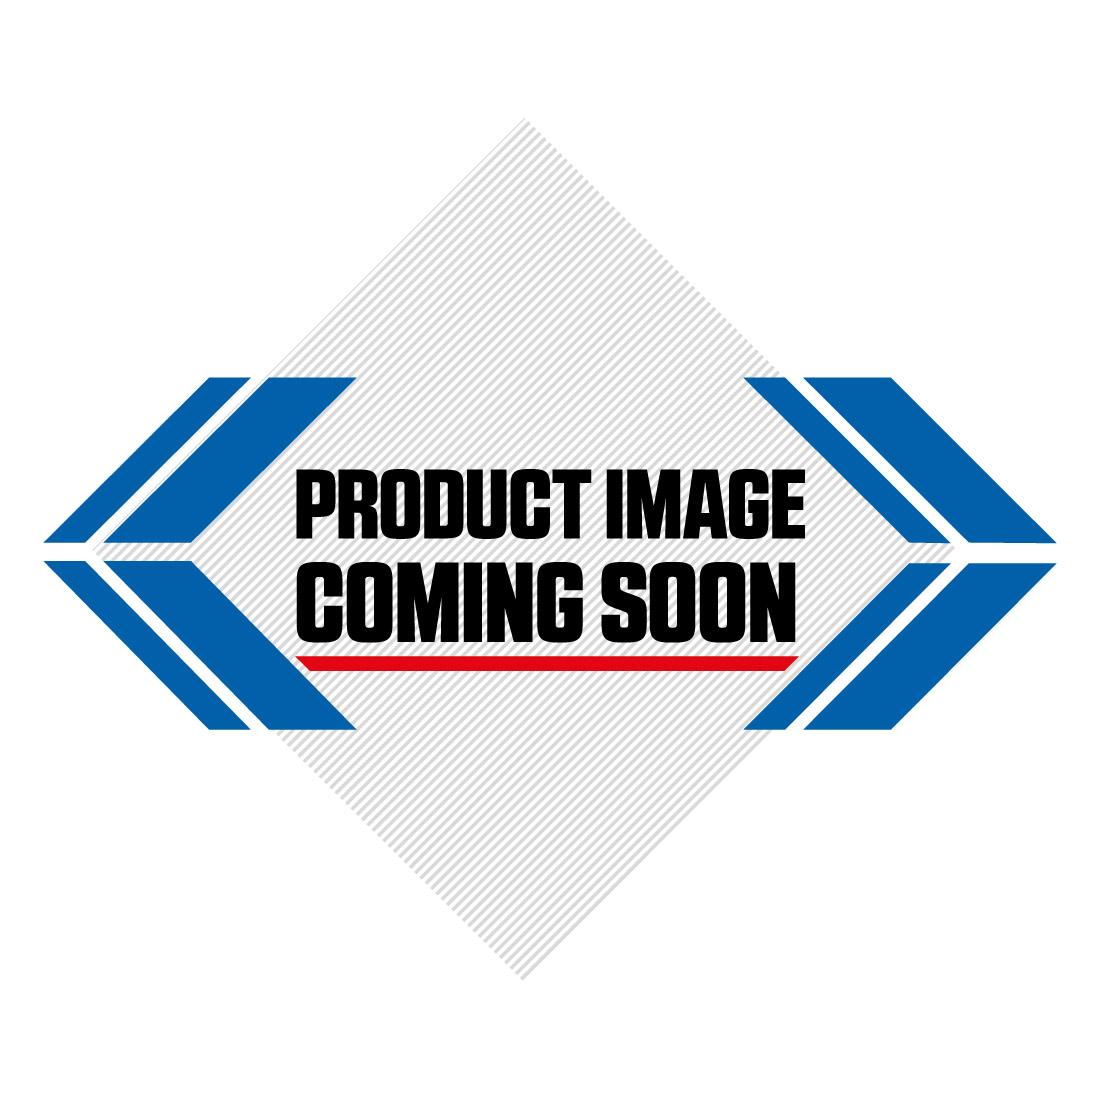 DJI Mavic Pro Fly More Combo 4K Quadcopter Drone Image-6>